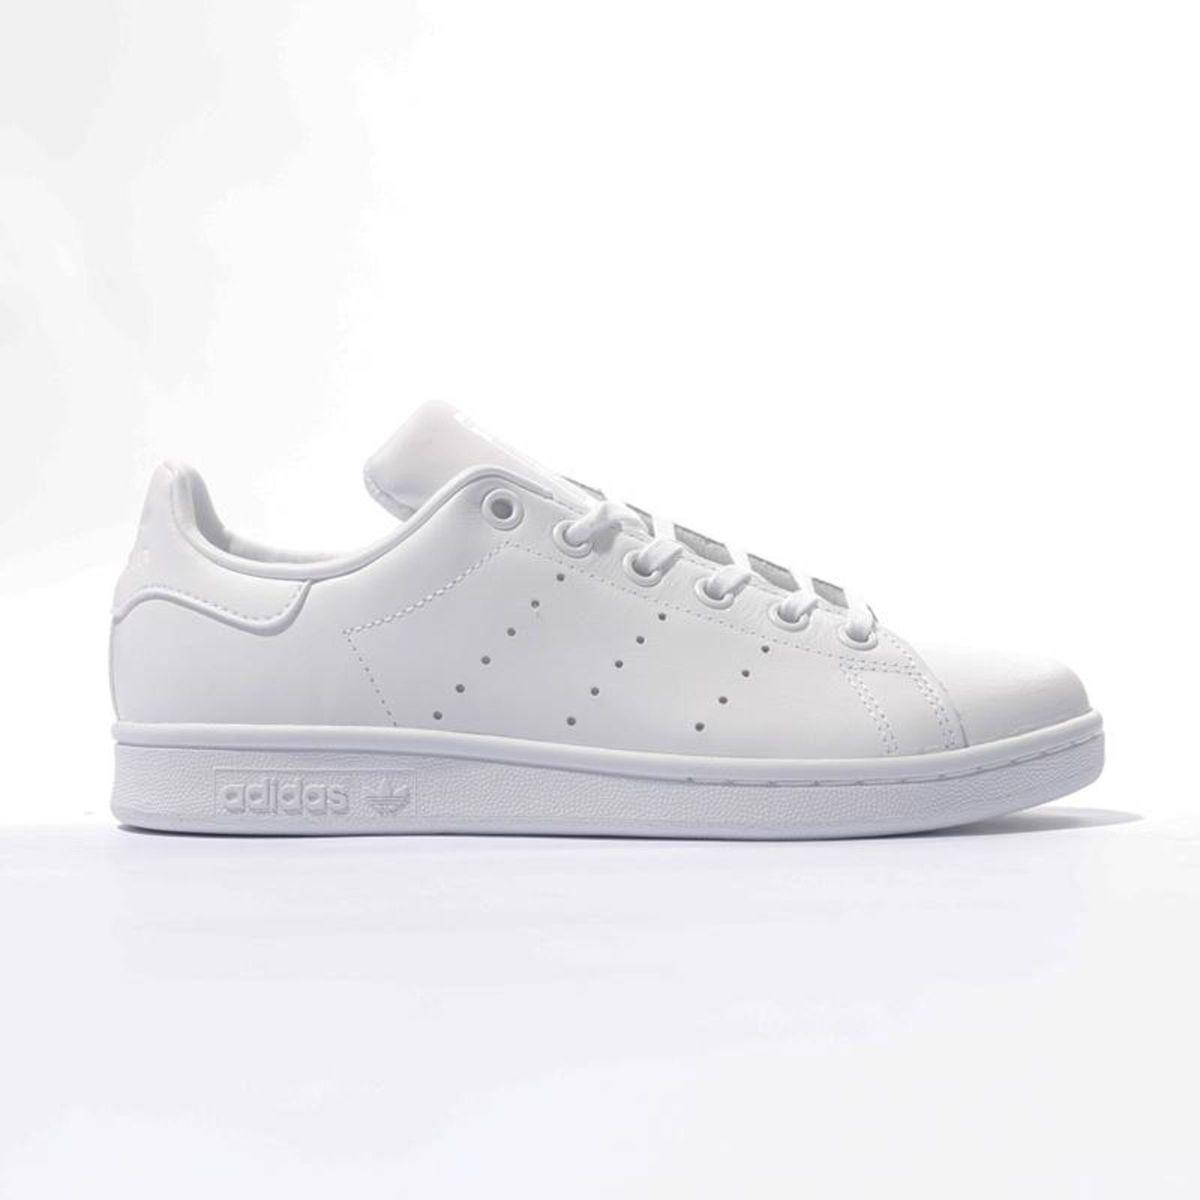 ac413ecc1 Tenis Adidas Stan Smith Branco   Tênis Masculino Adidas Nunca Usado  20768583   enjoei